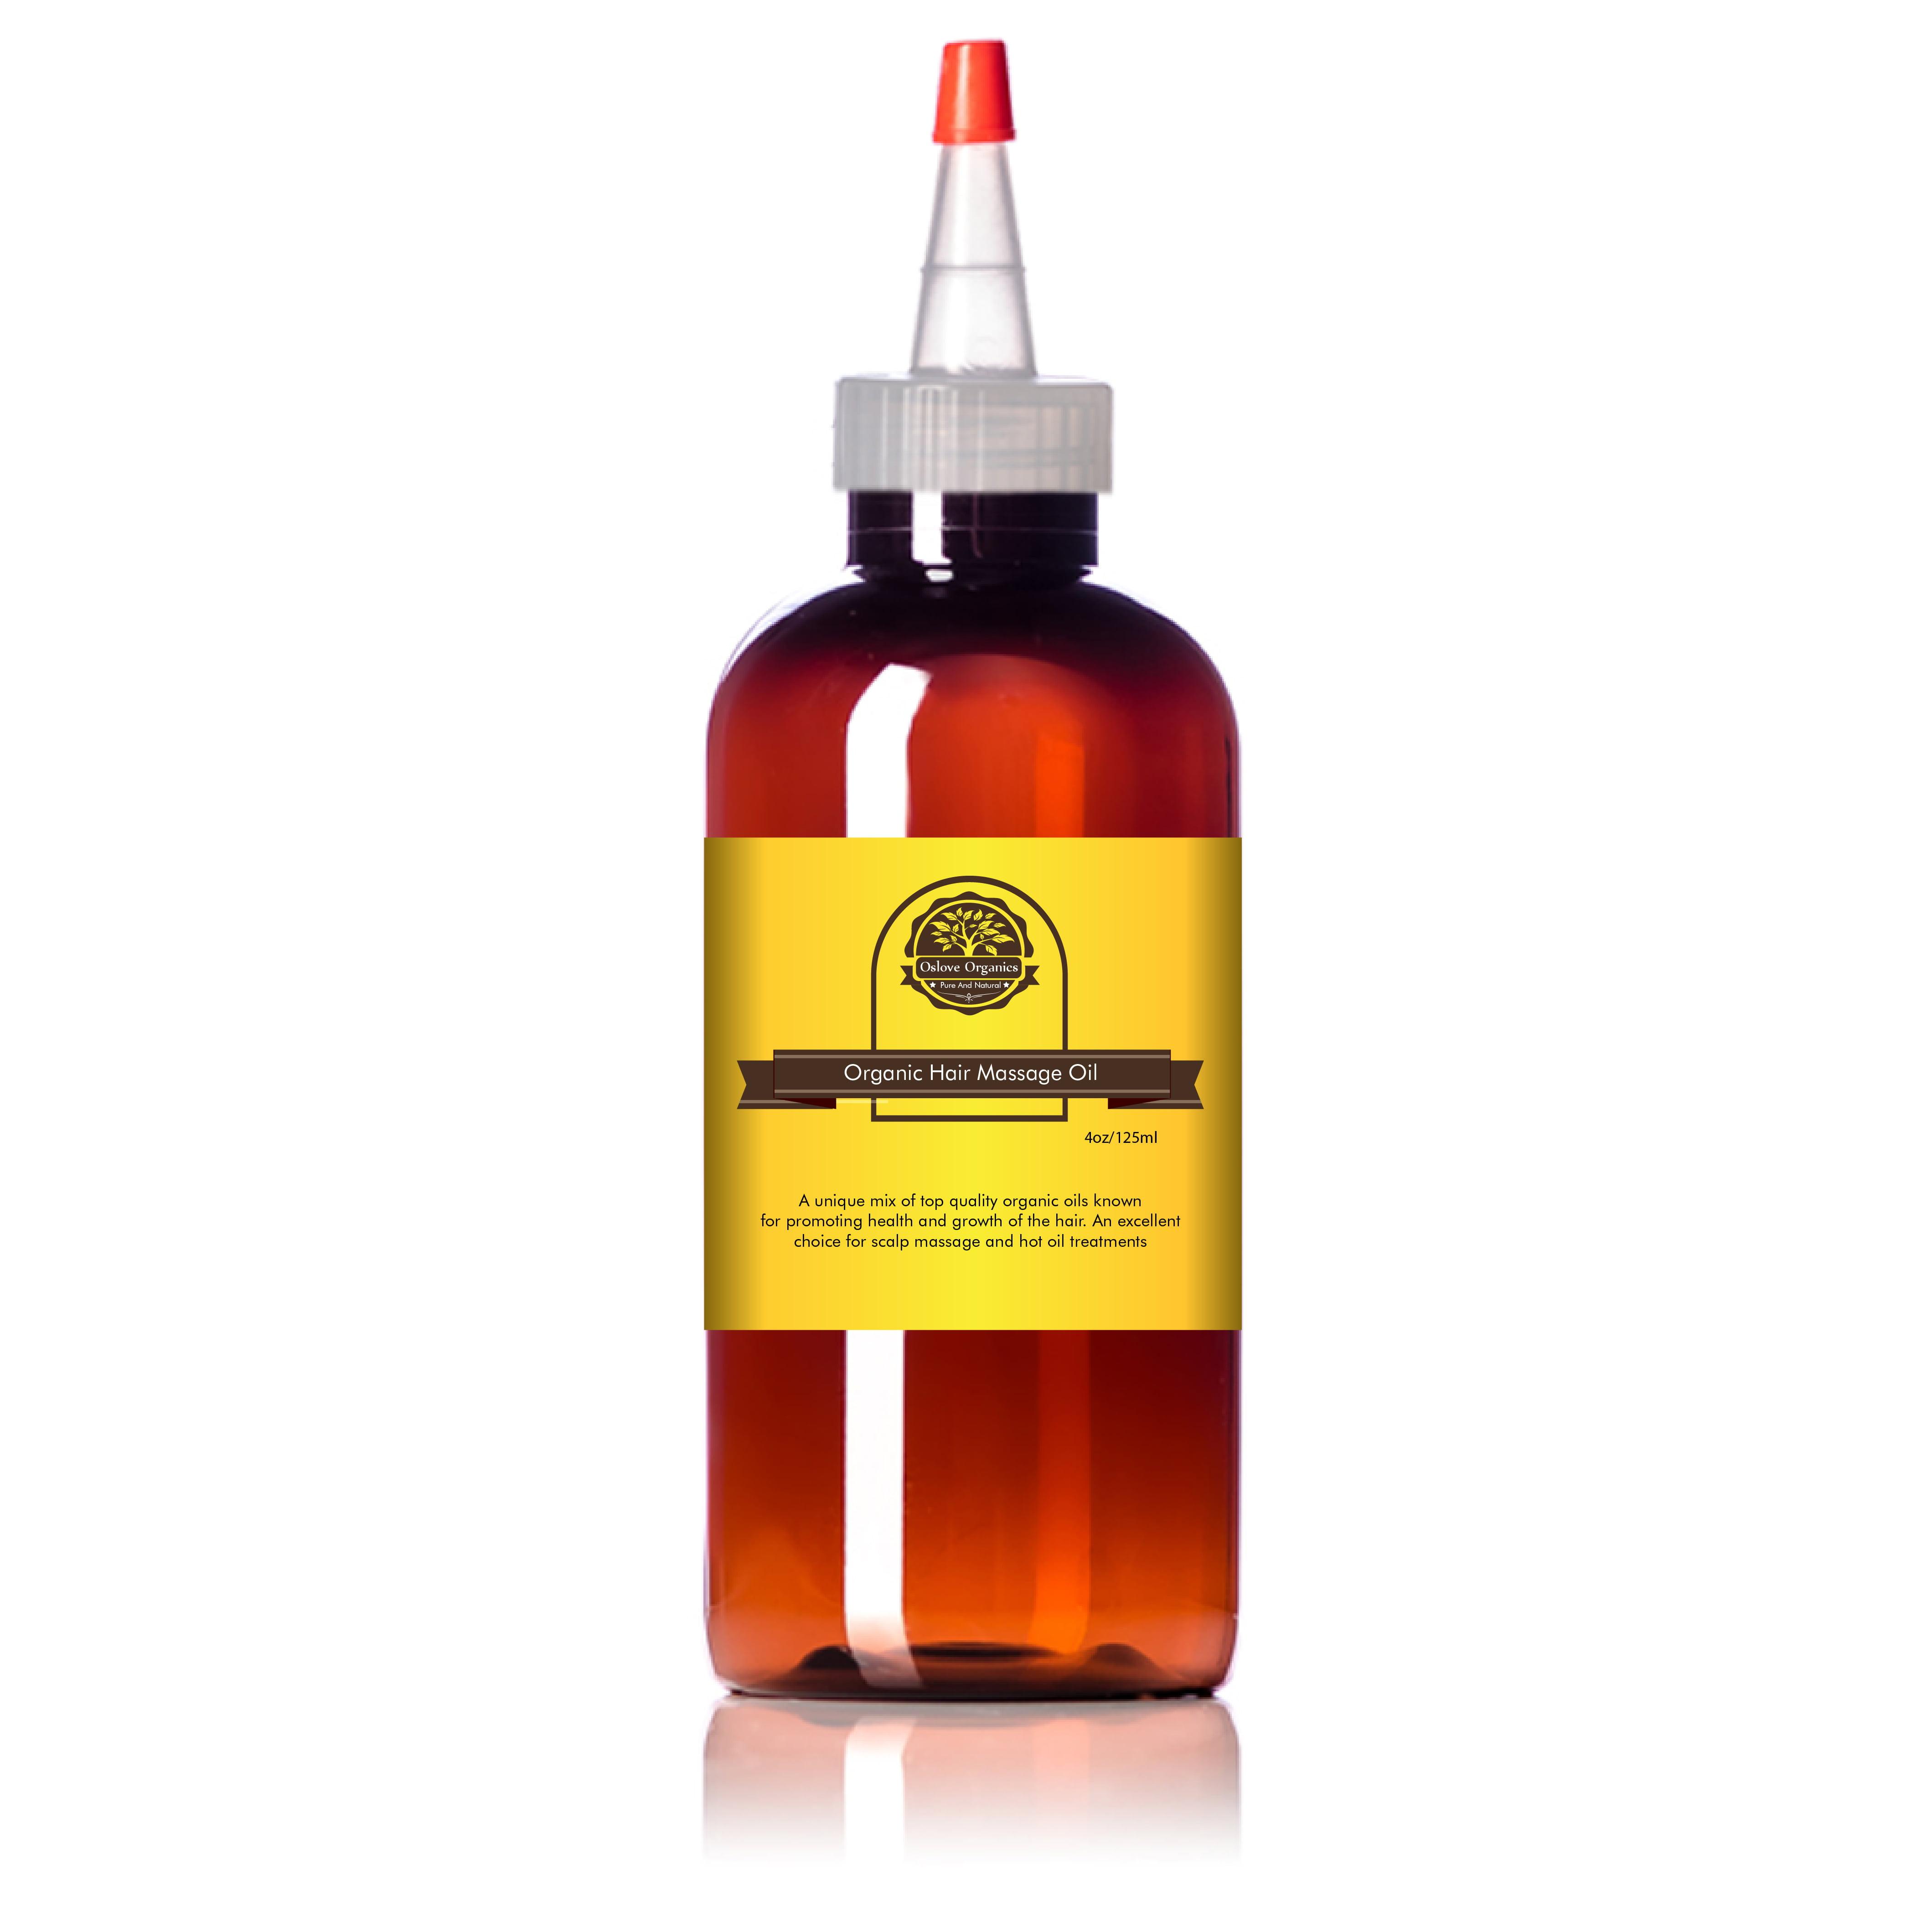 Organic Hair Growth Oil By Oslove Organics Blend Of Virgin Organic Oils For Fast Hair Growth Walmart Com Walmart Com